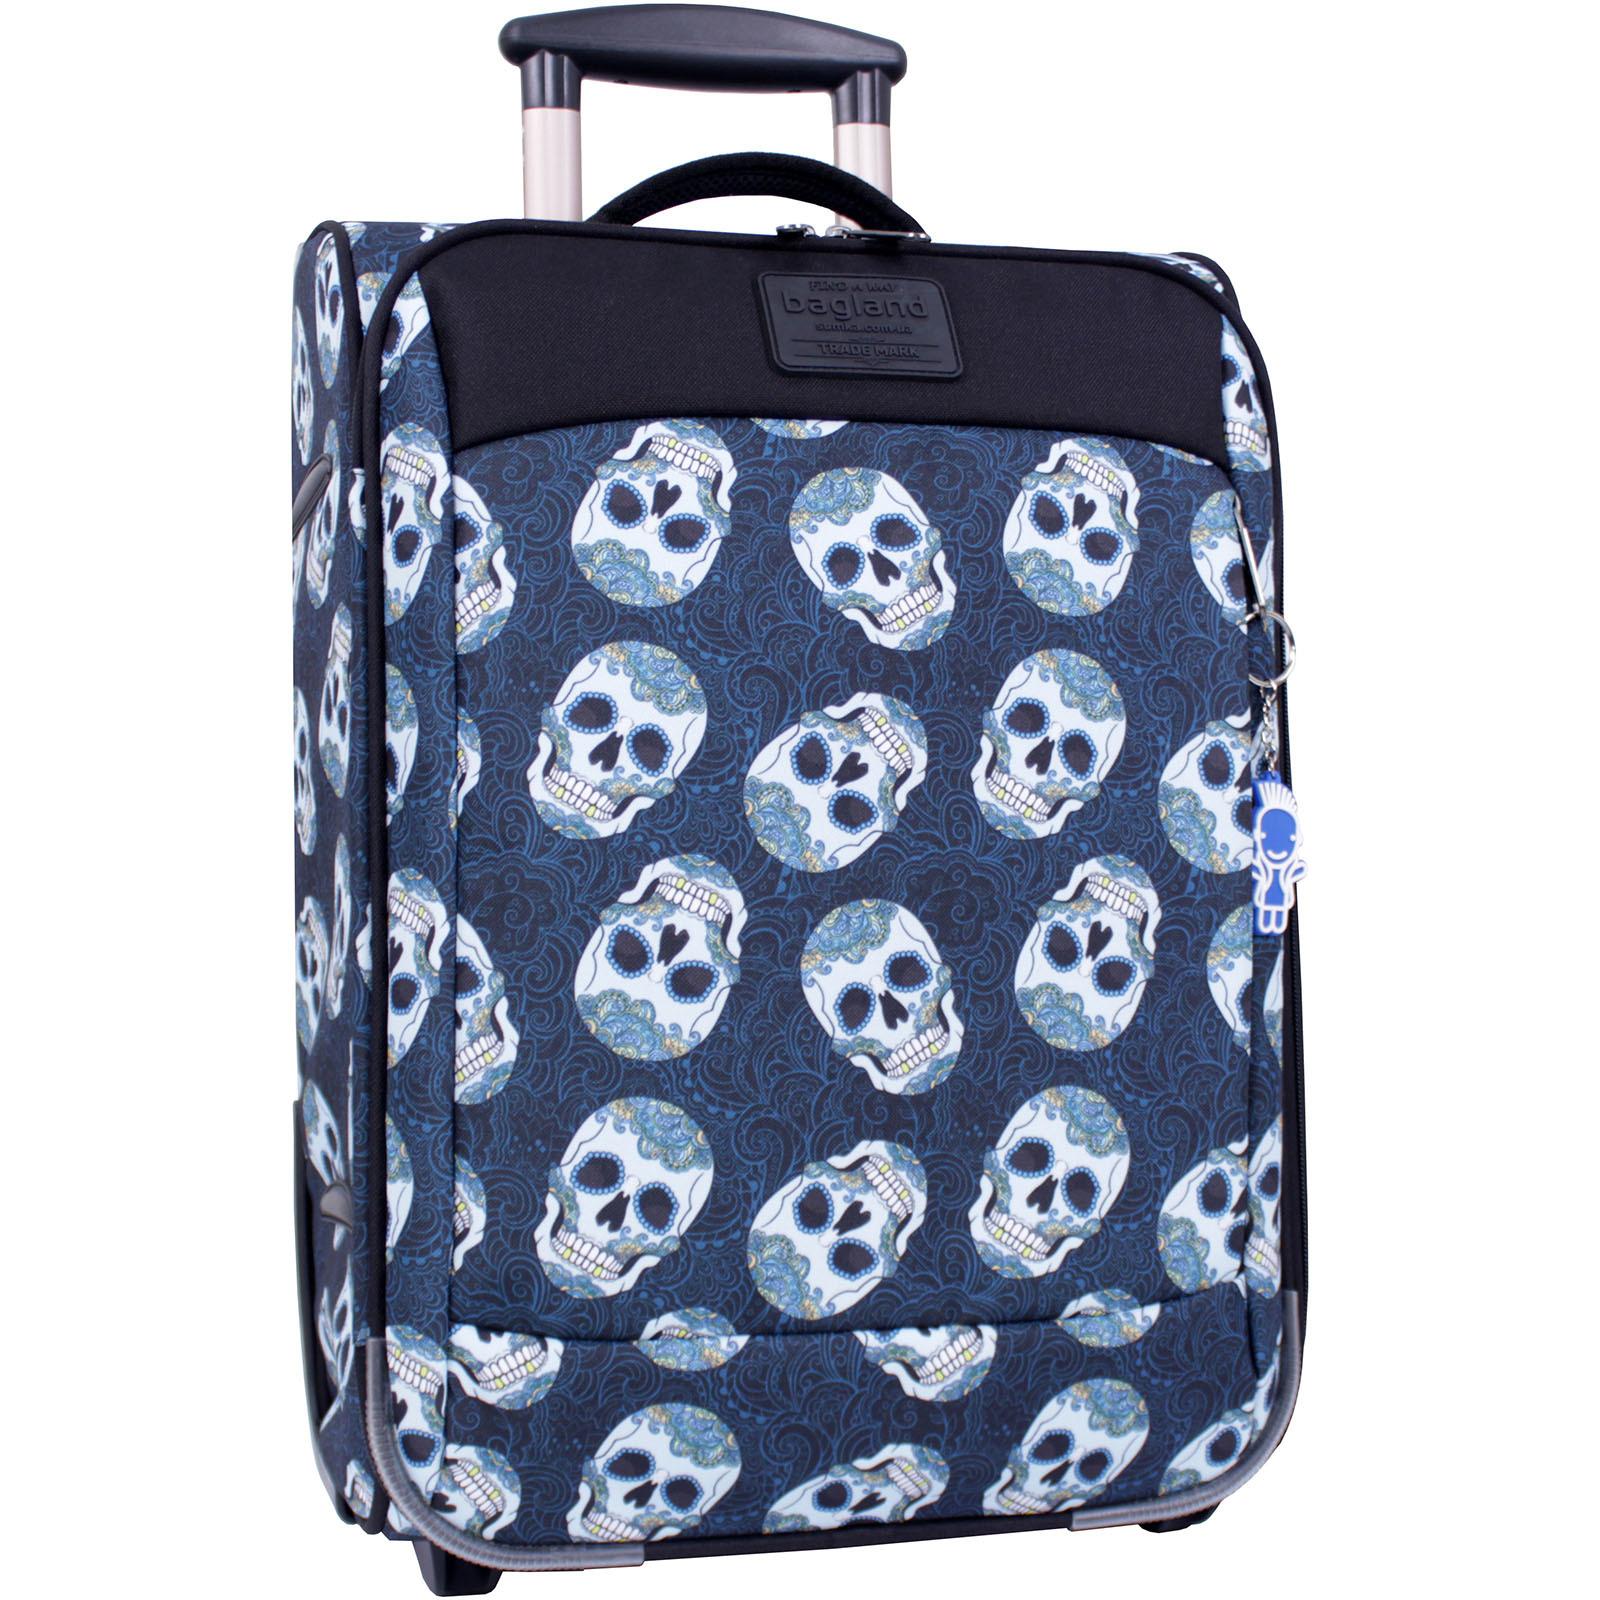 Дорожные чемоданы Чемодан Bagland Vichenzo 32 л. сублімація 444 (0037666194) IMG_7293_суб.444_.JPG